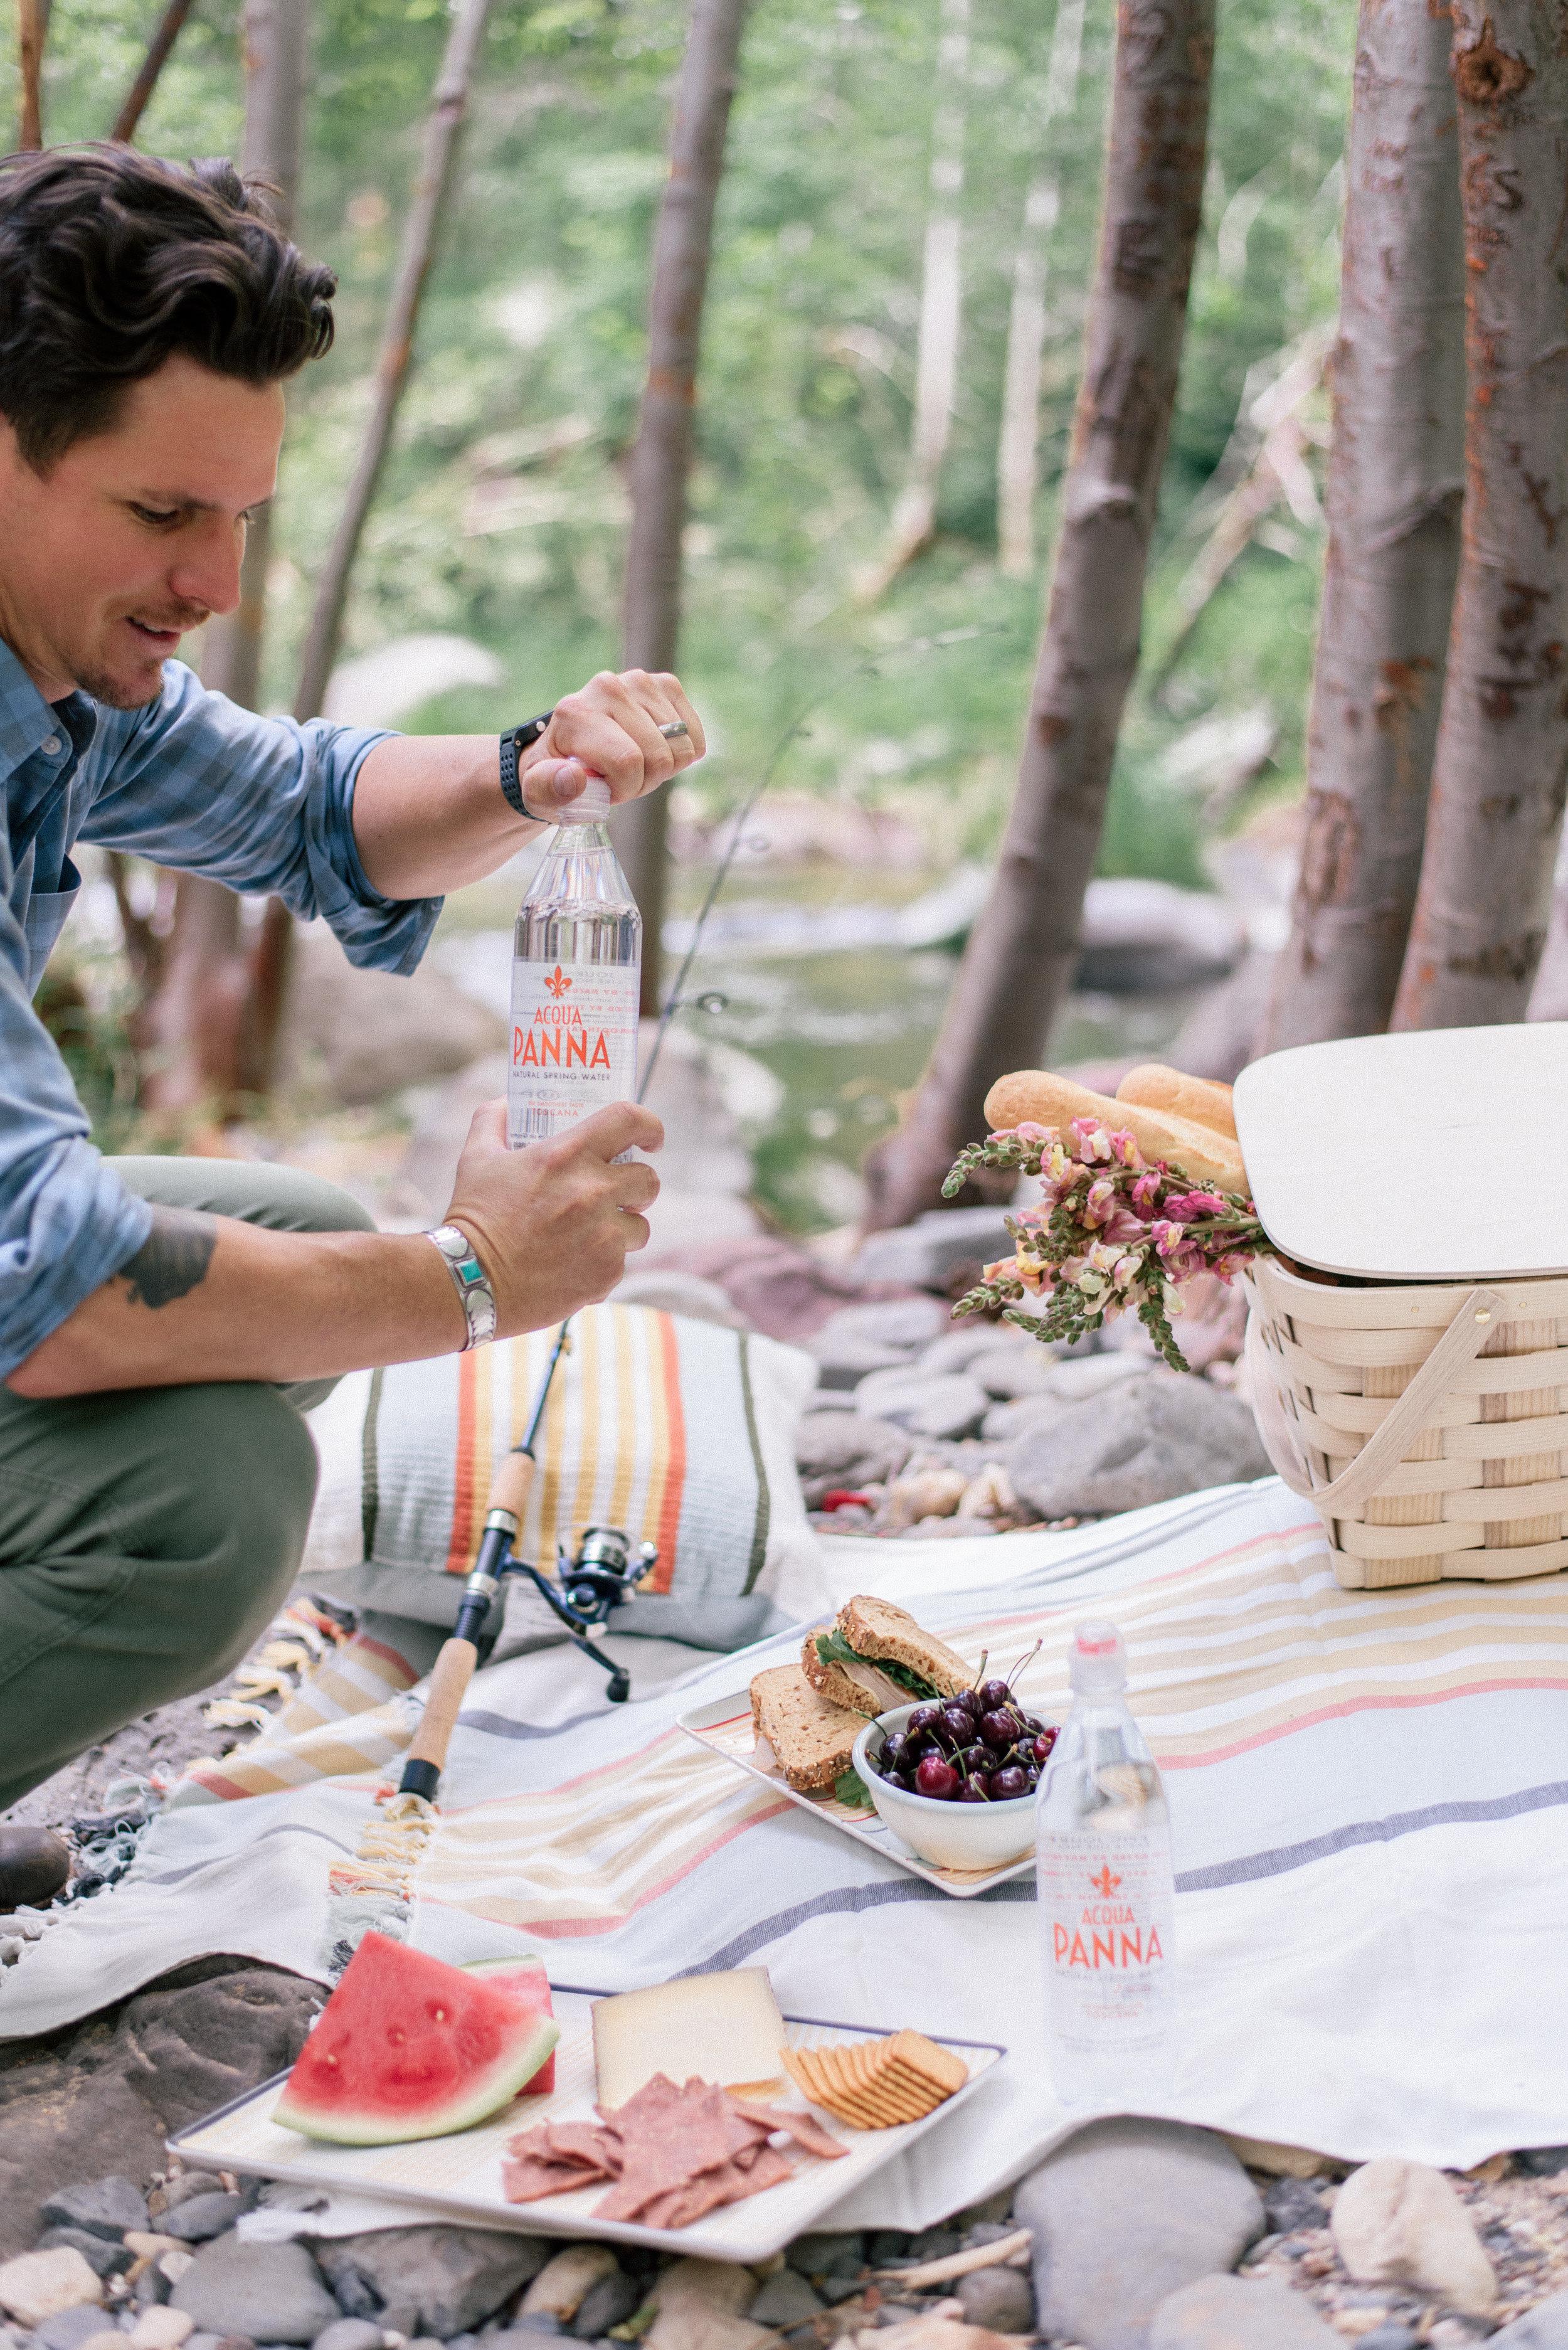 Summer and Fall Family Bucket List Ideas